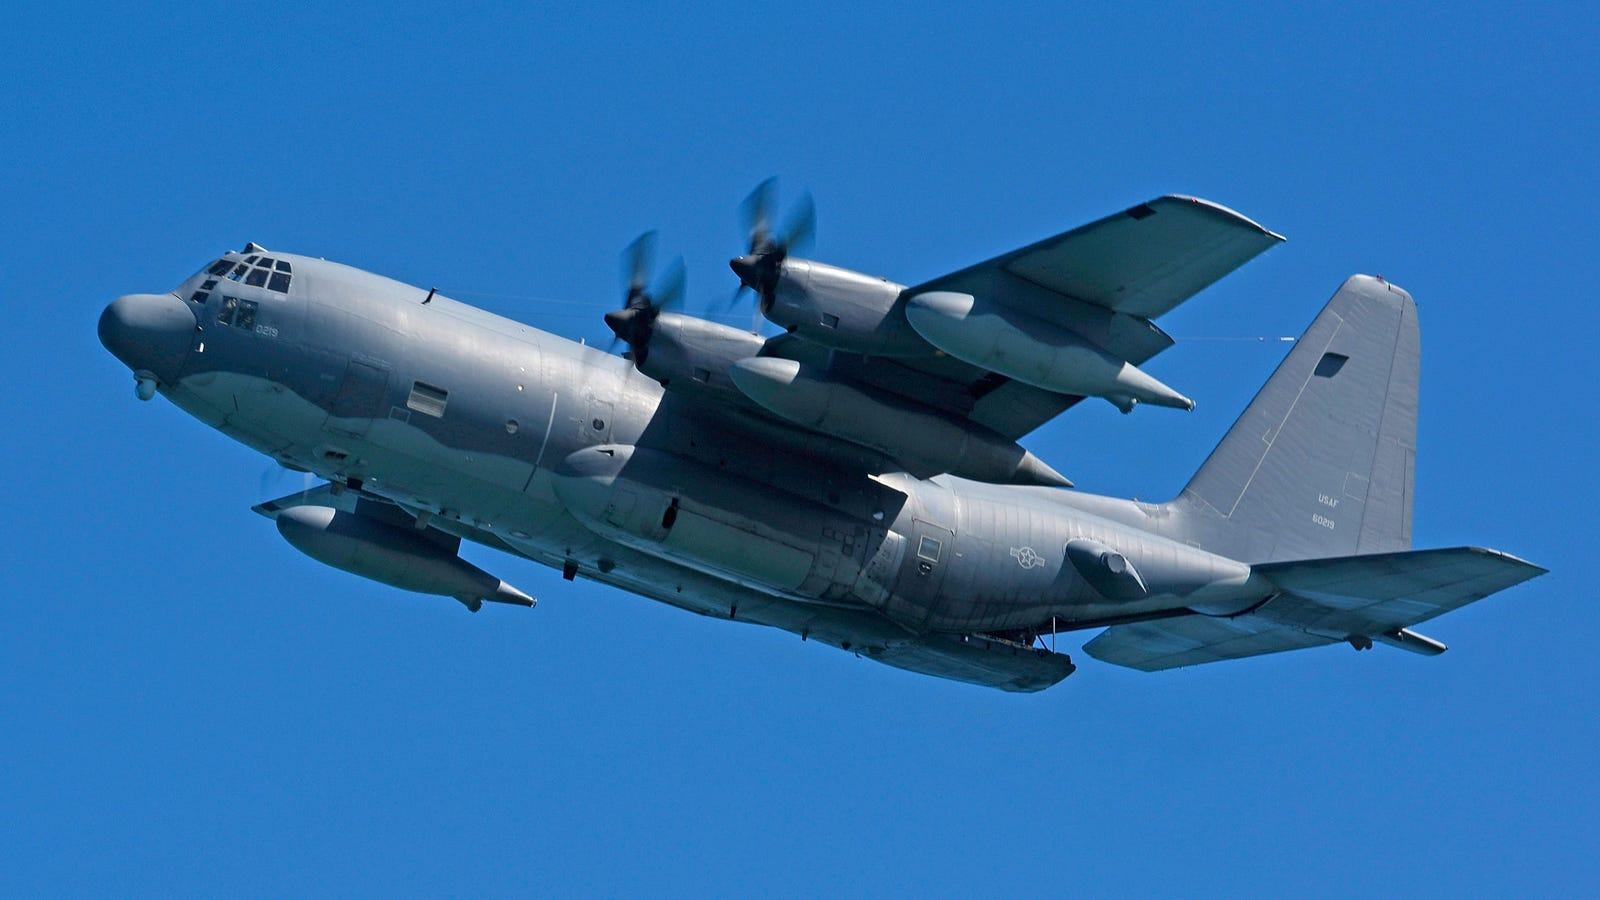 Pentagon Accuses China Of Striking Us Military Aircraft